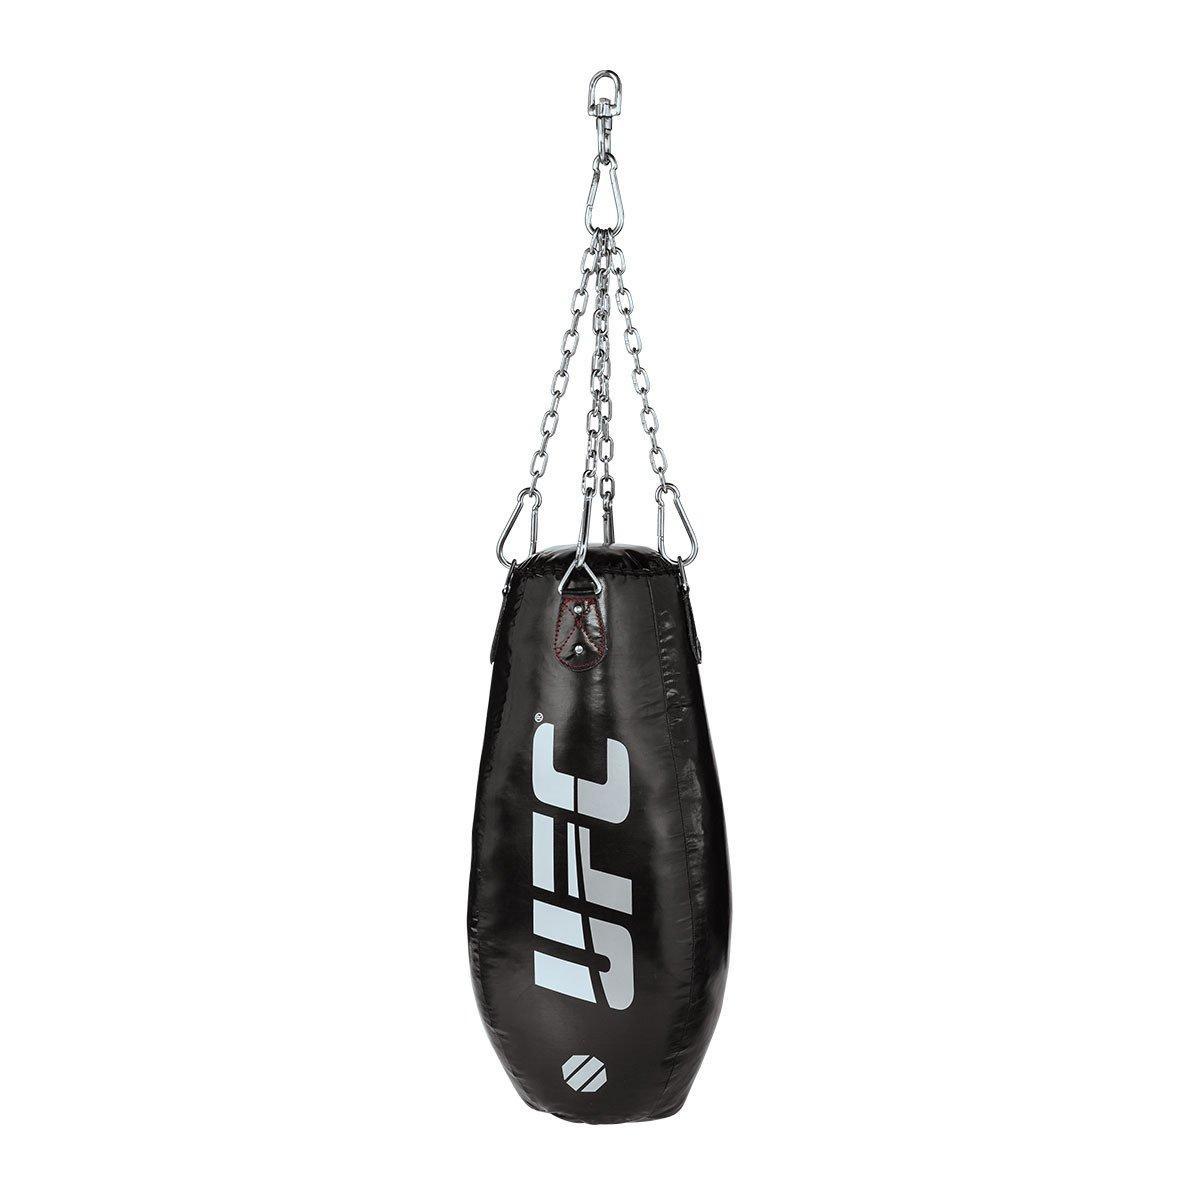 Century® UFC Professional 60 lb. Vinyl Teardrop Heavy Bag